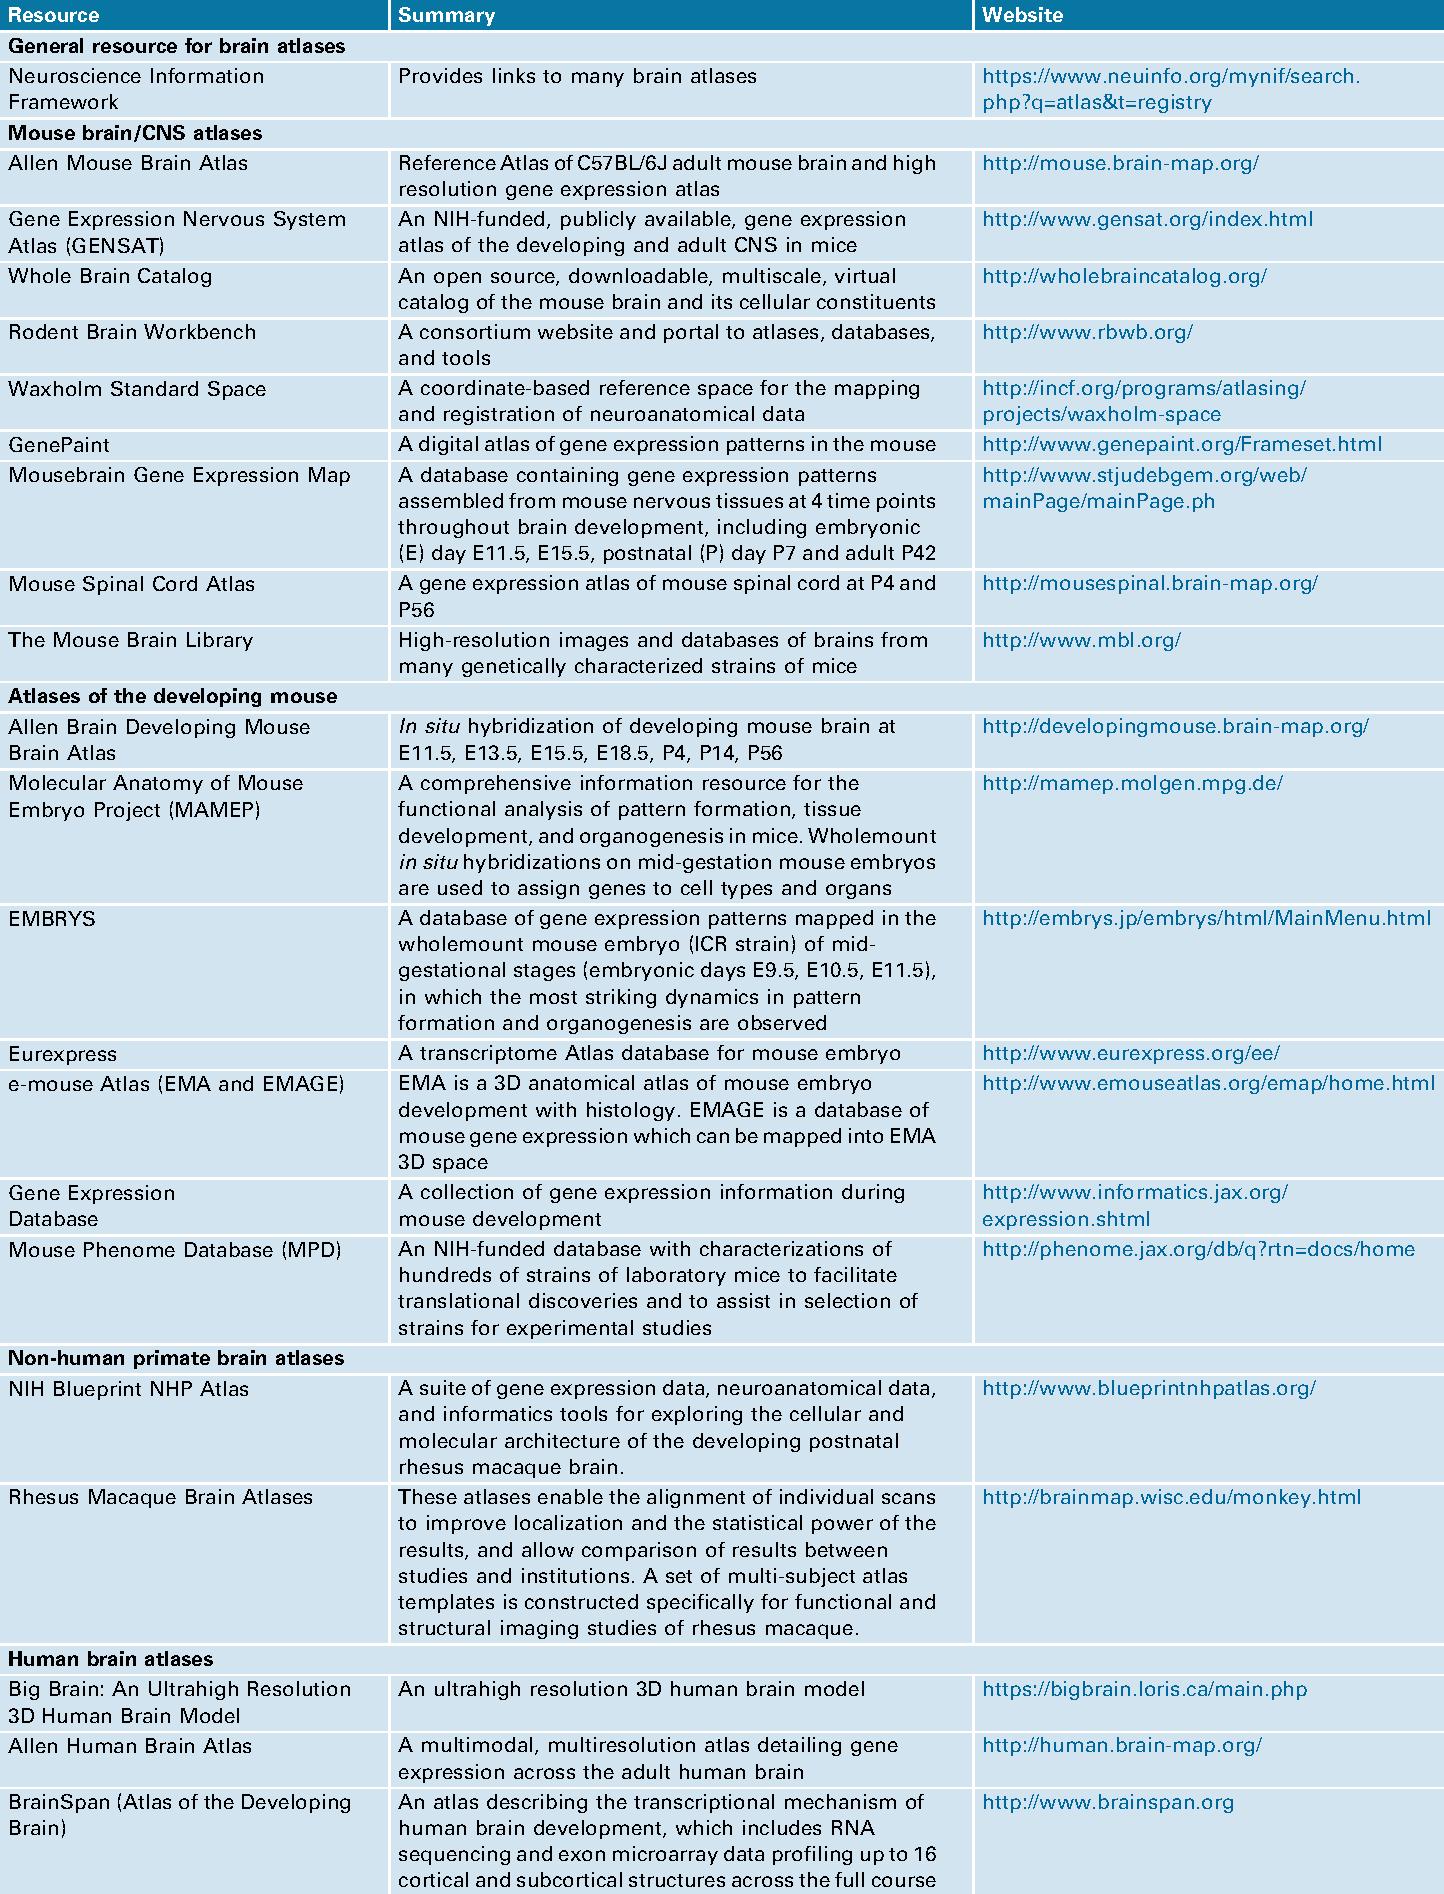 Table 1 from Molecular neuroanatomy: a generation of